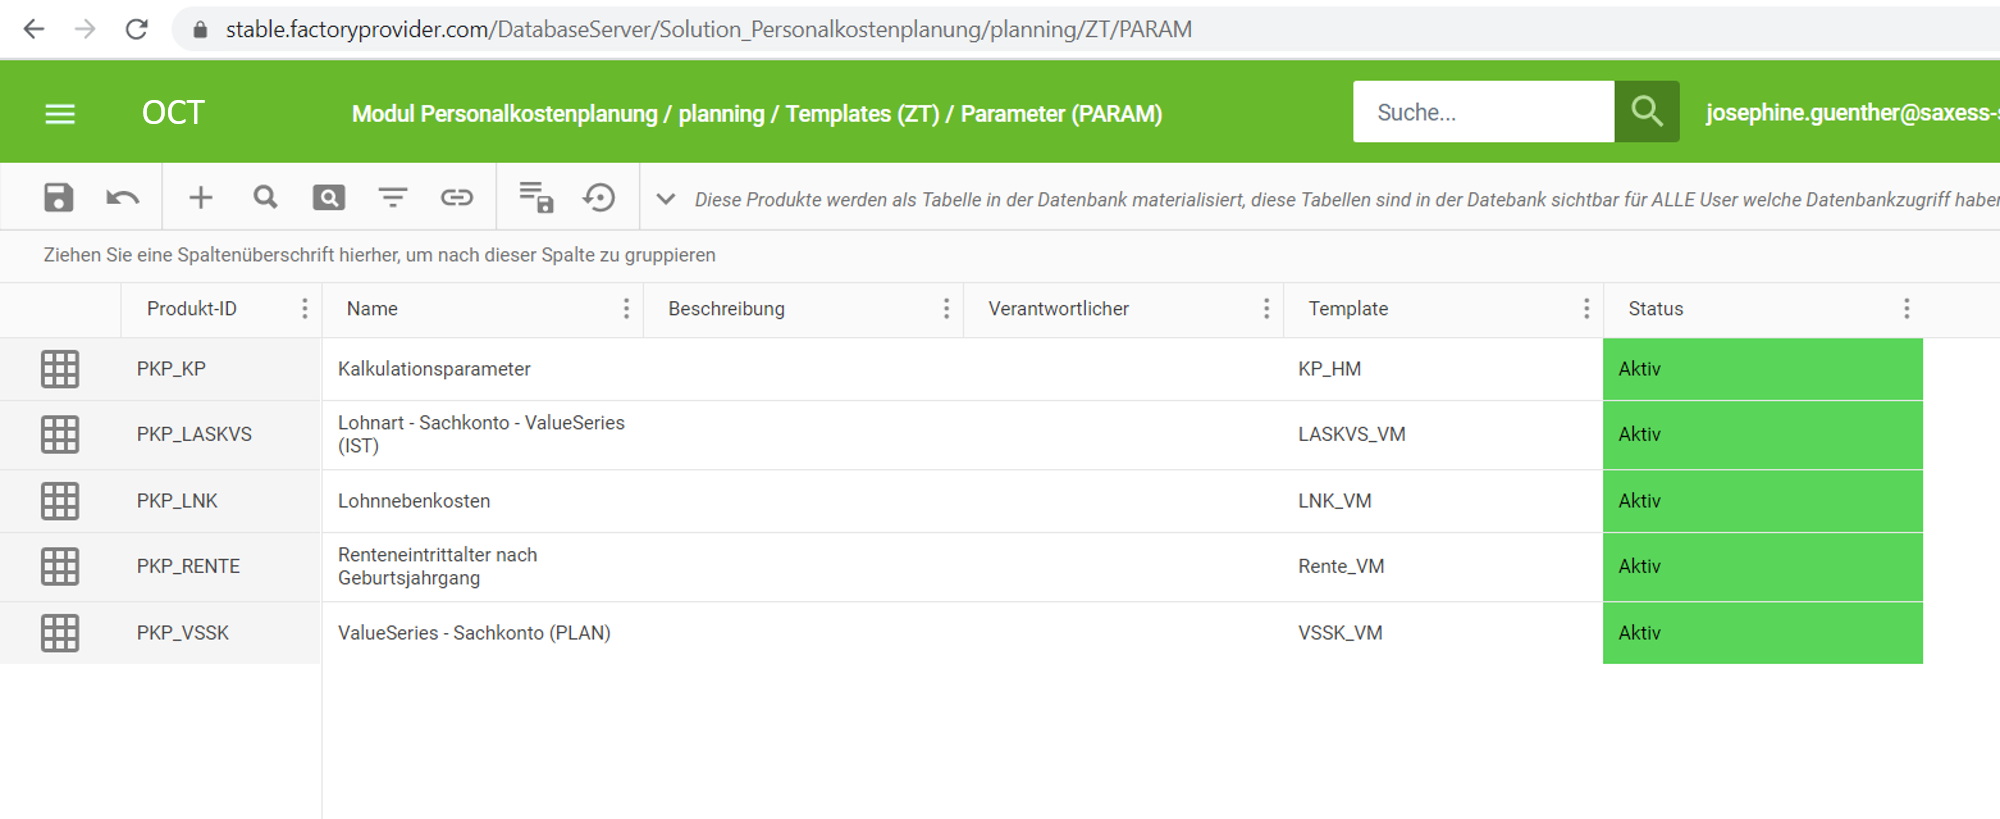 Parameter Lohnnebenkosten